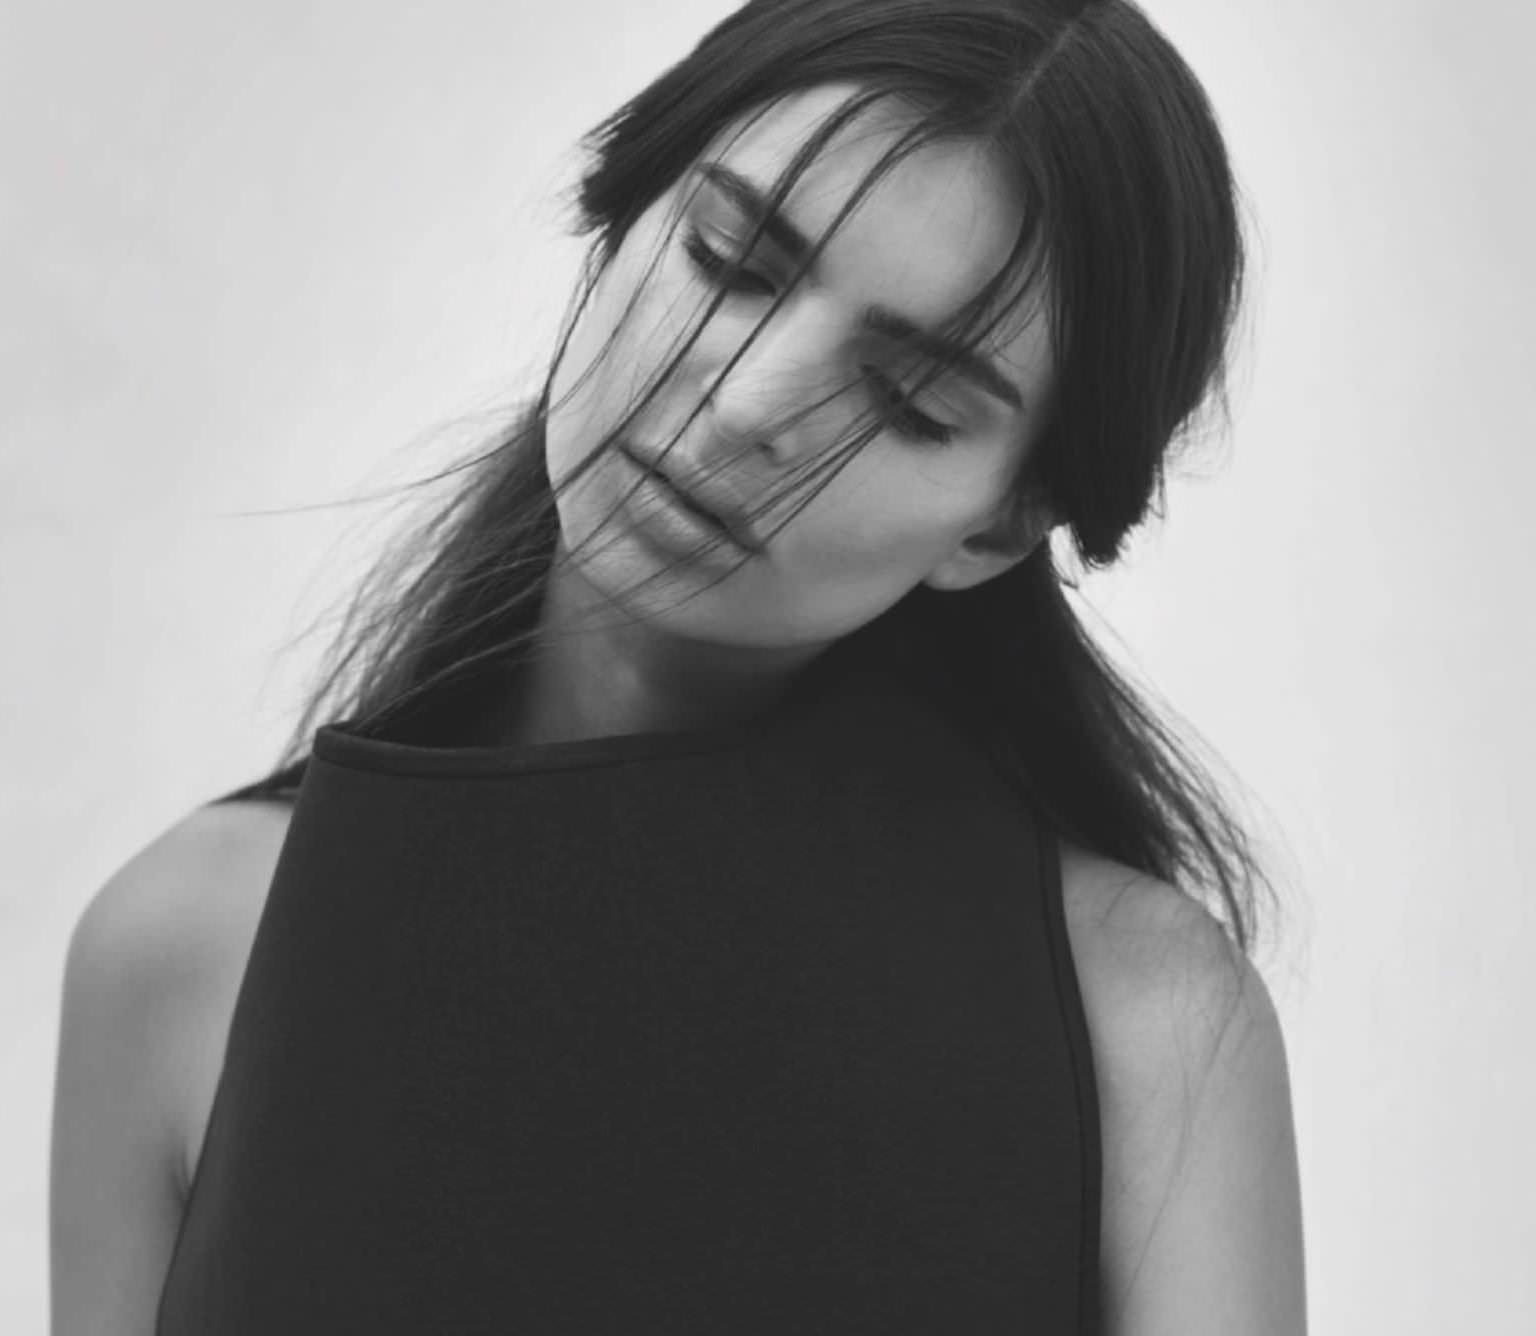 Emily Ratajkowski - 'I've Never Been Shy Of My Body'